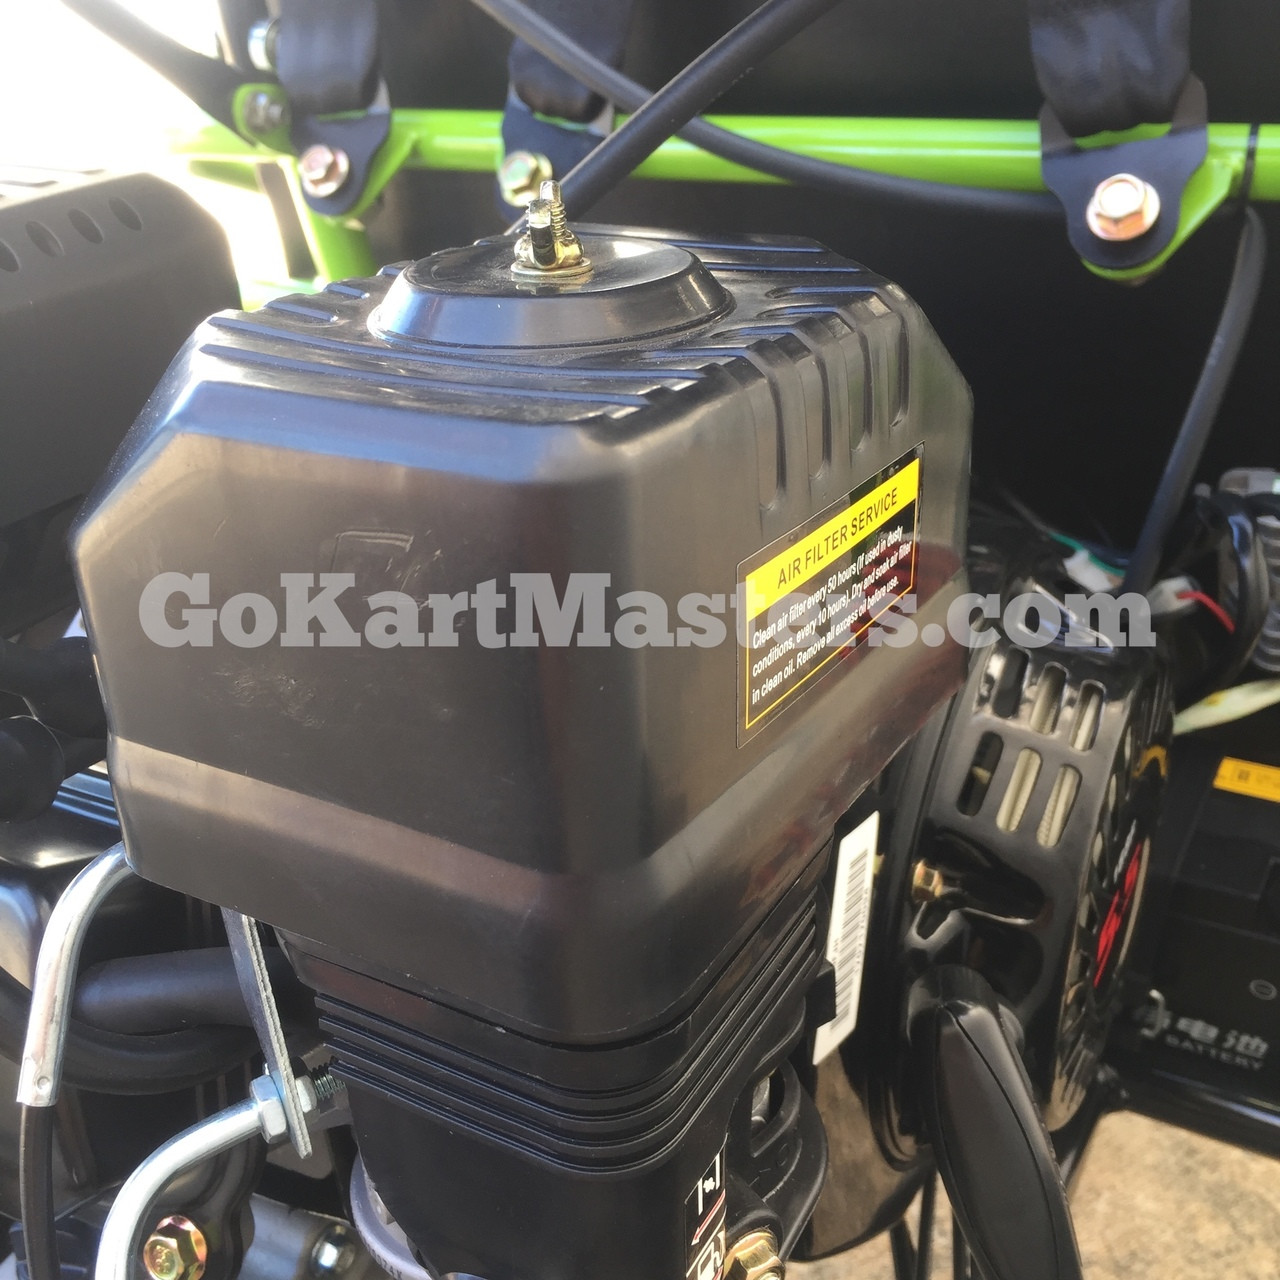 TrailMaster Mini XRX/R+ Go Kart - Air Filter